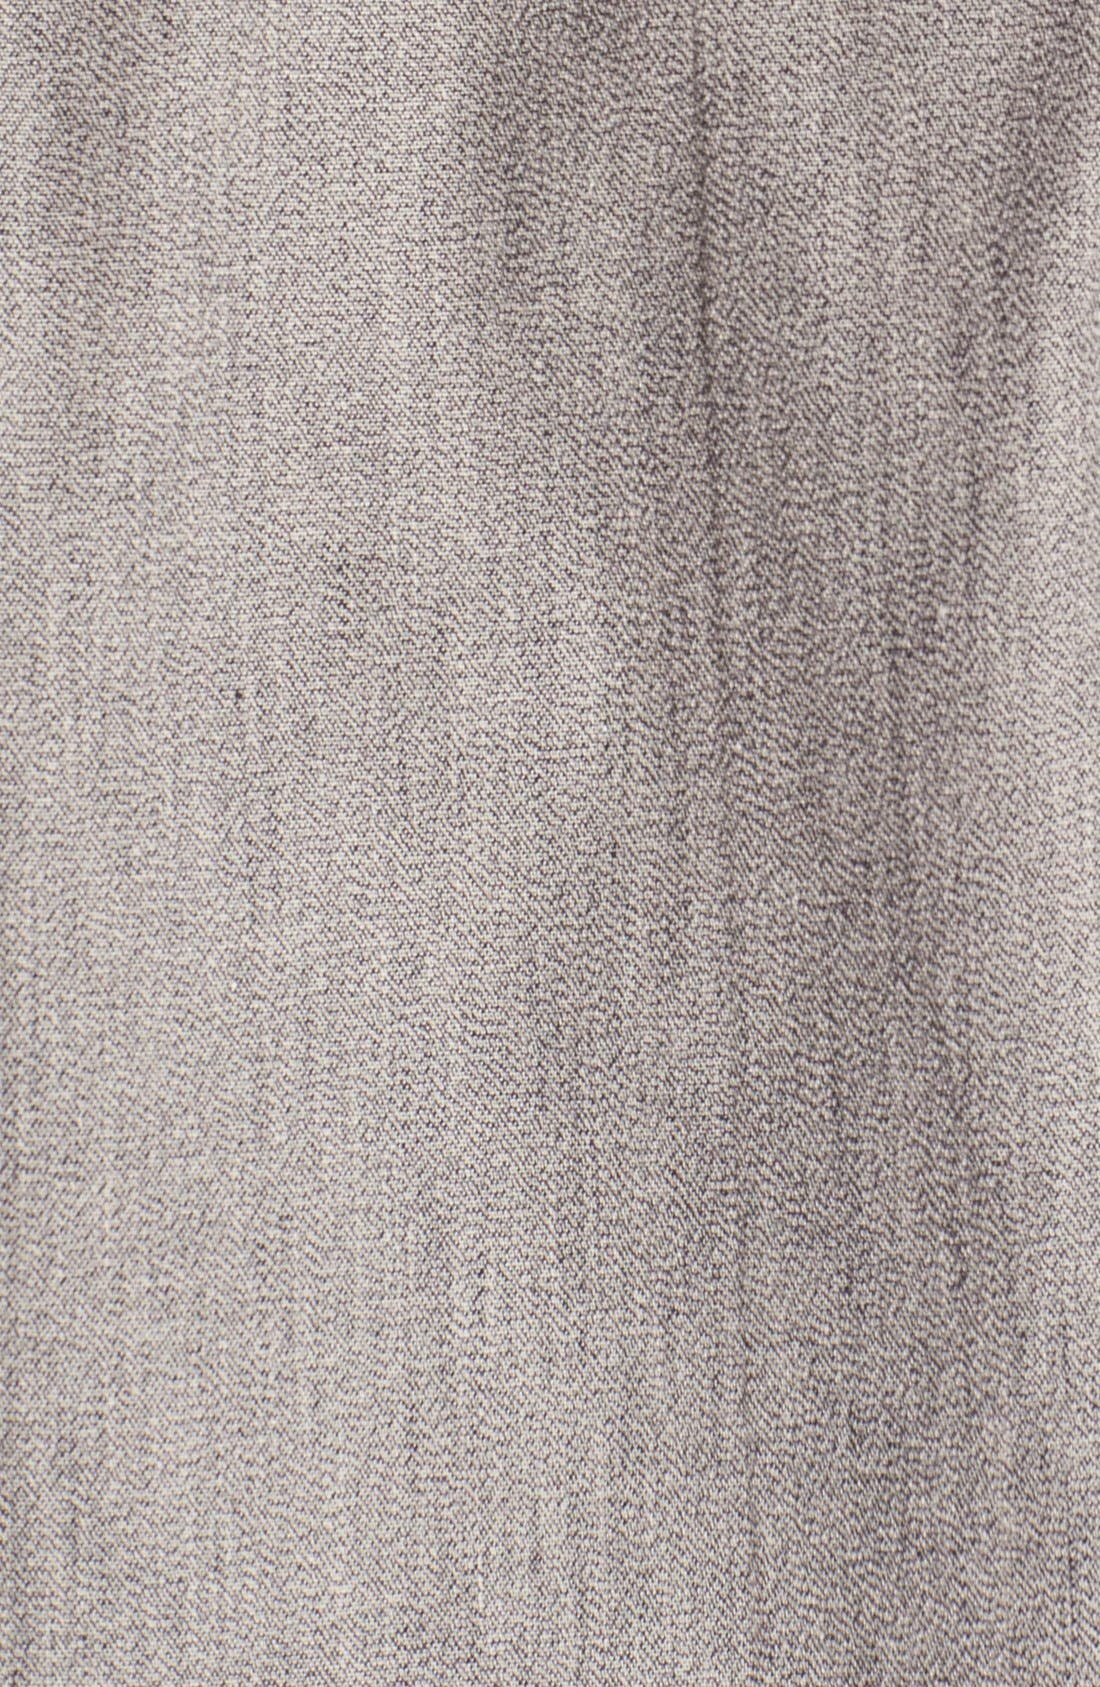 Alternate Image 3  - Pendleton Portland Collection 'Yachats' Cotton Shirt